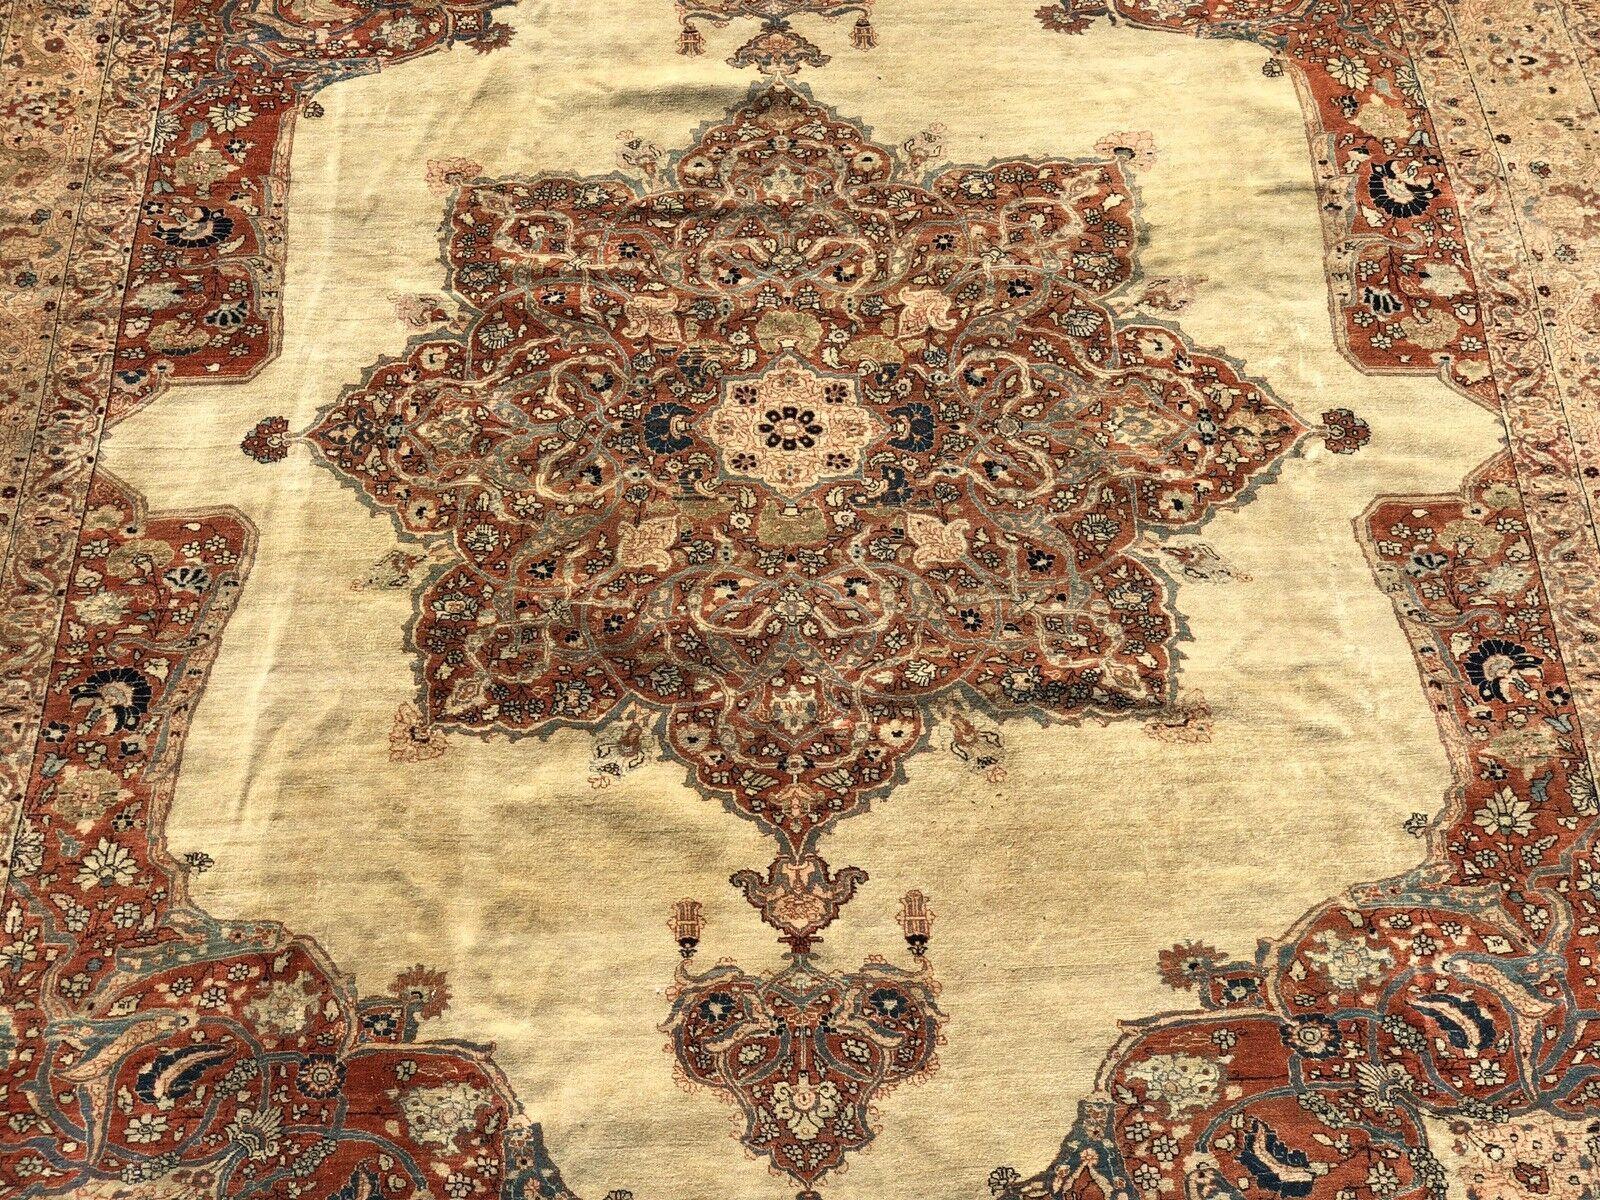 Auth 19th C Persian Collectors Masterpiece Rare Hadji Jalili Tabrize 10x12 Nr Ebay Rugs On Carpet Persian